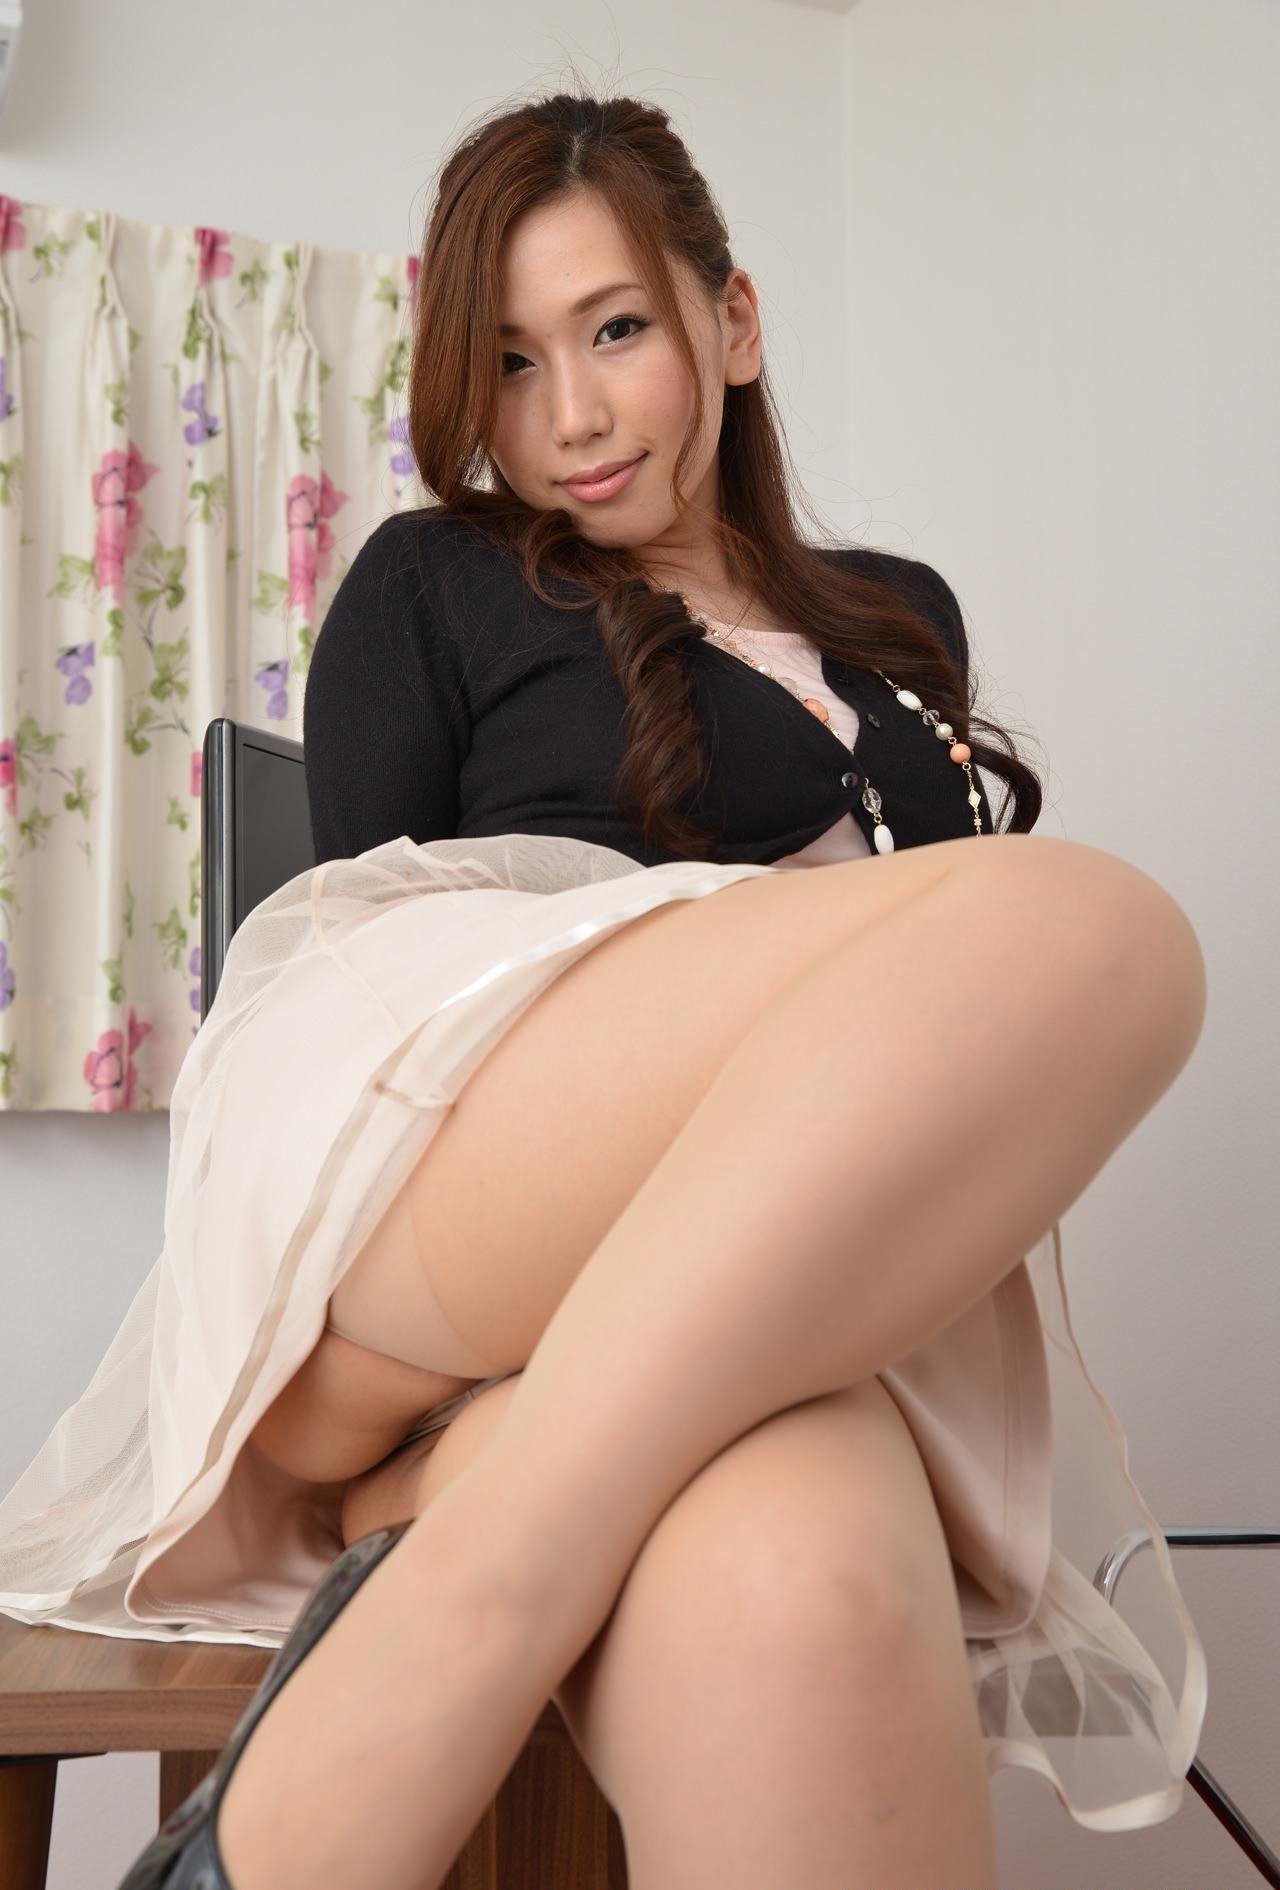 georgina reilly naked